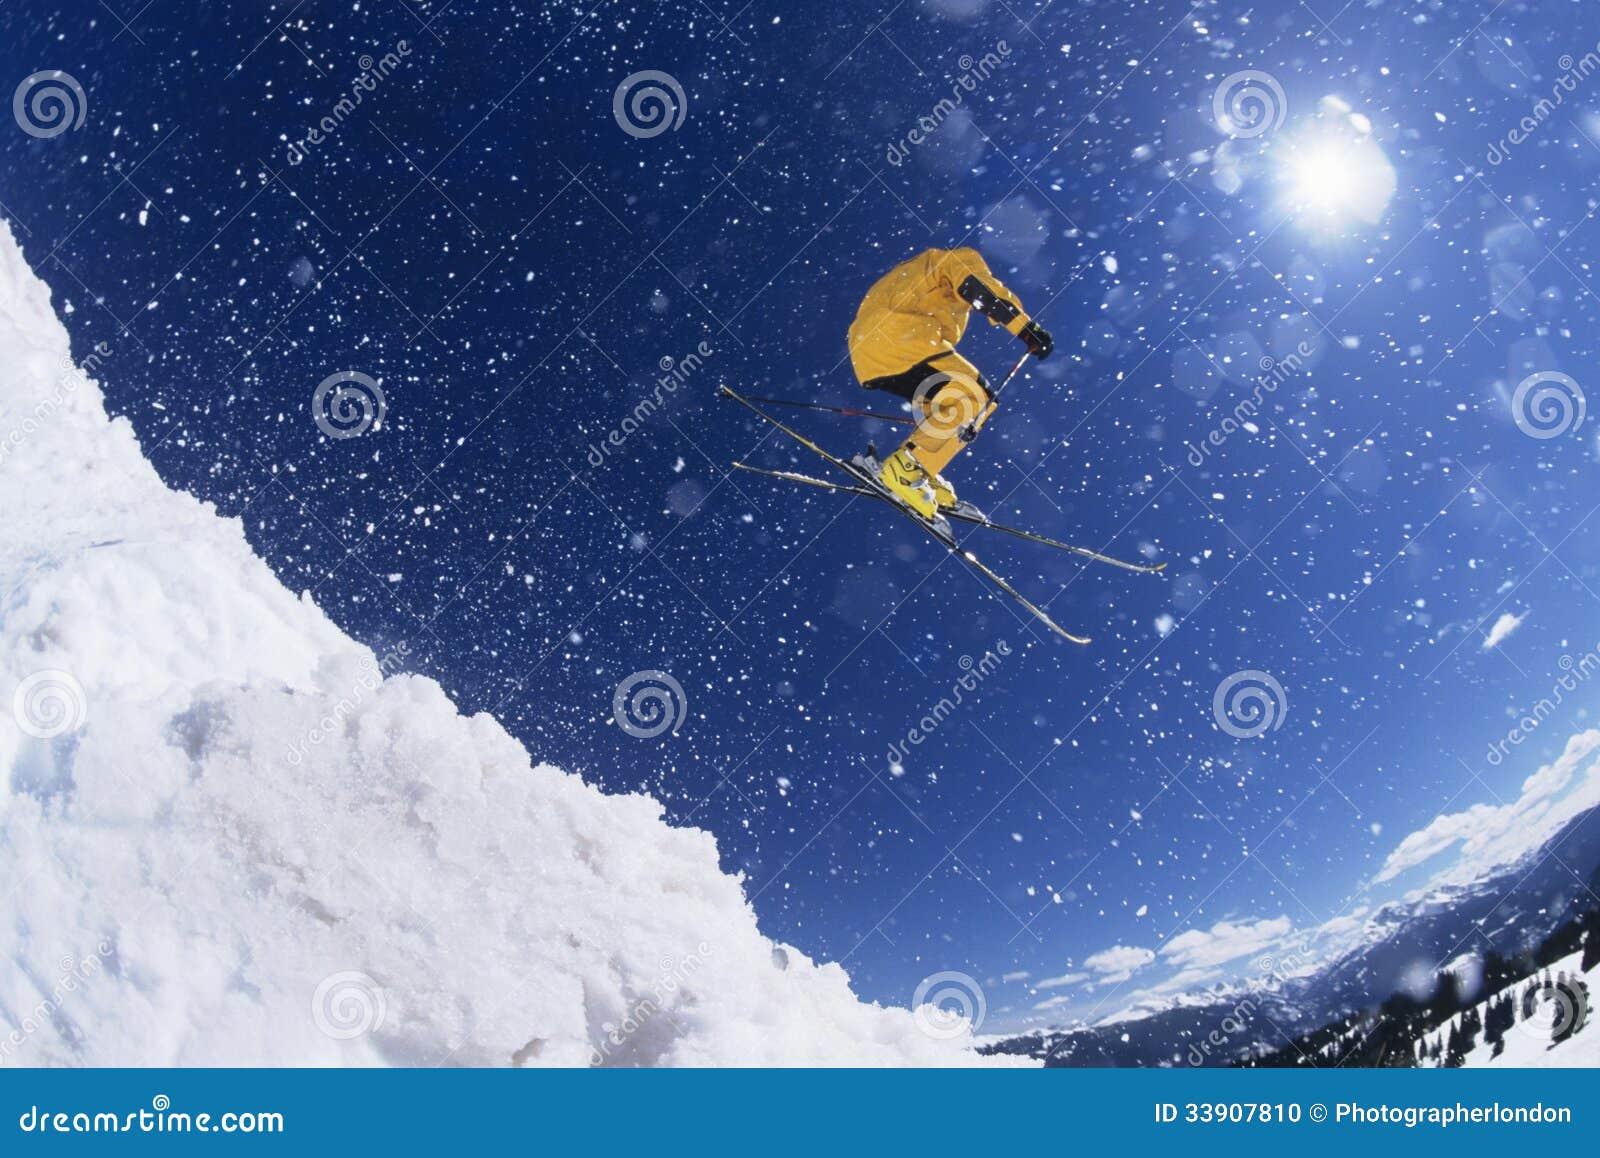 Skier in midair above snow